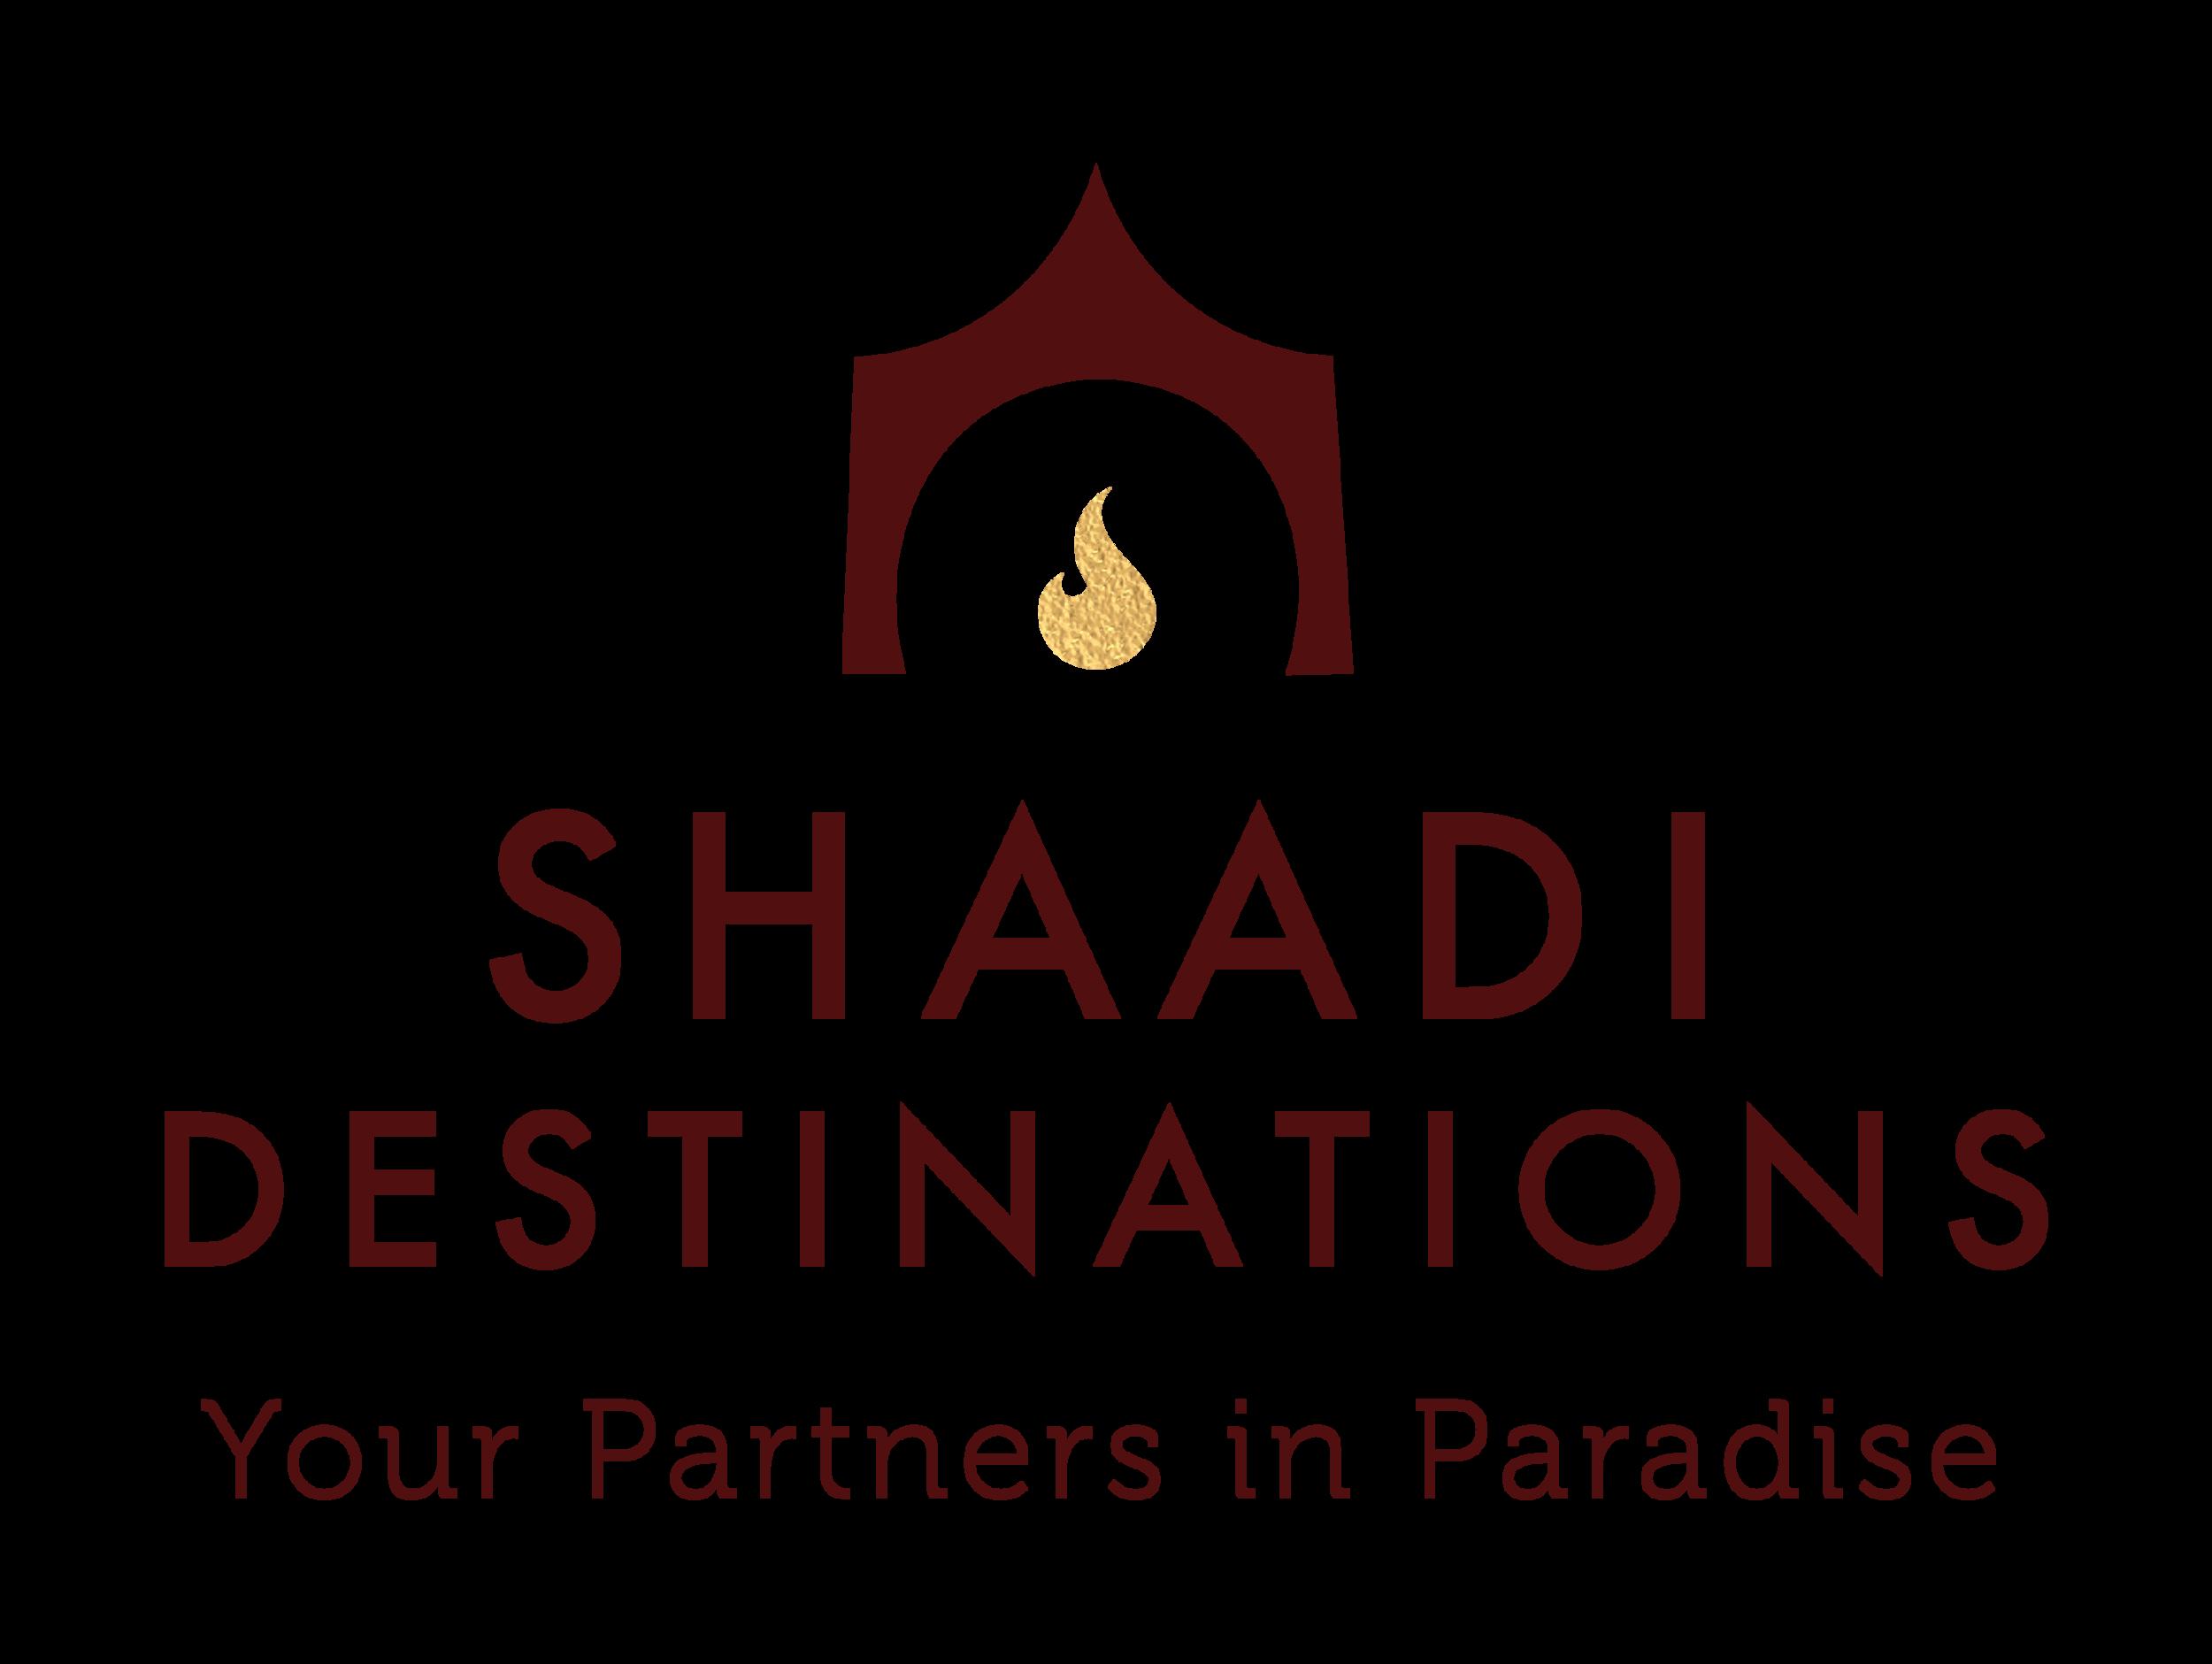 Shaadi Destinations logo 2